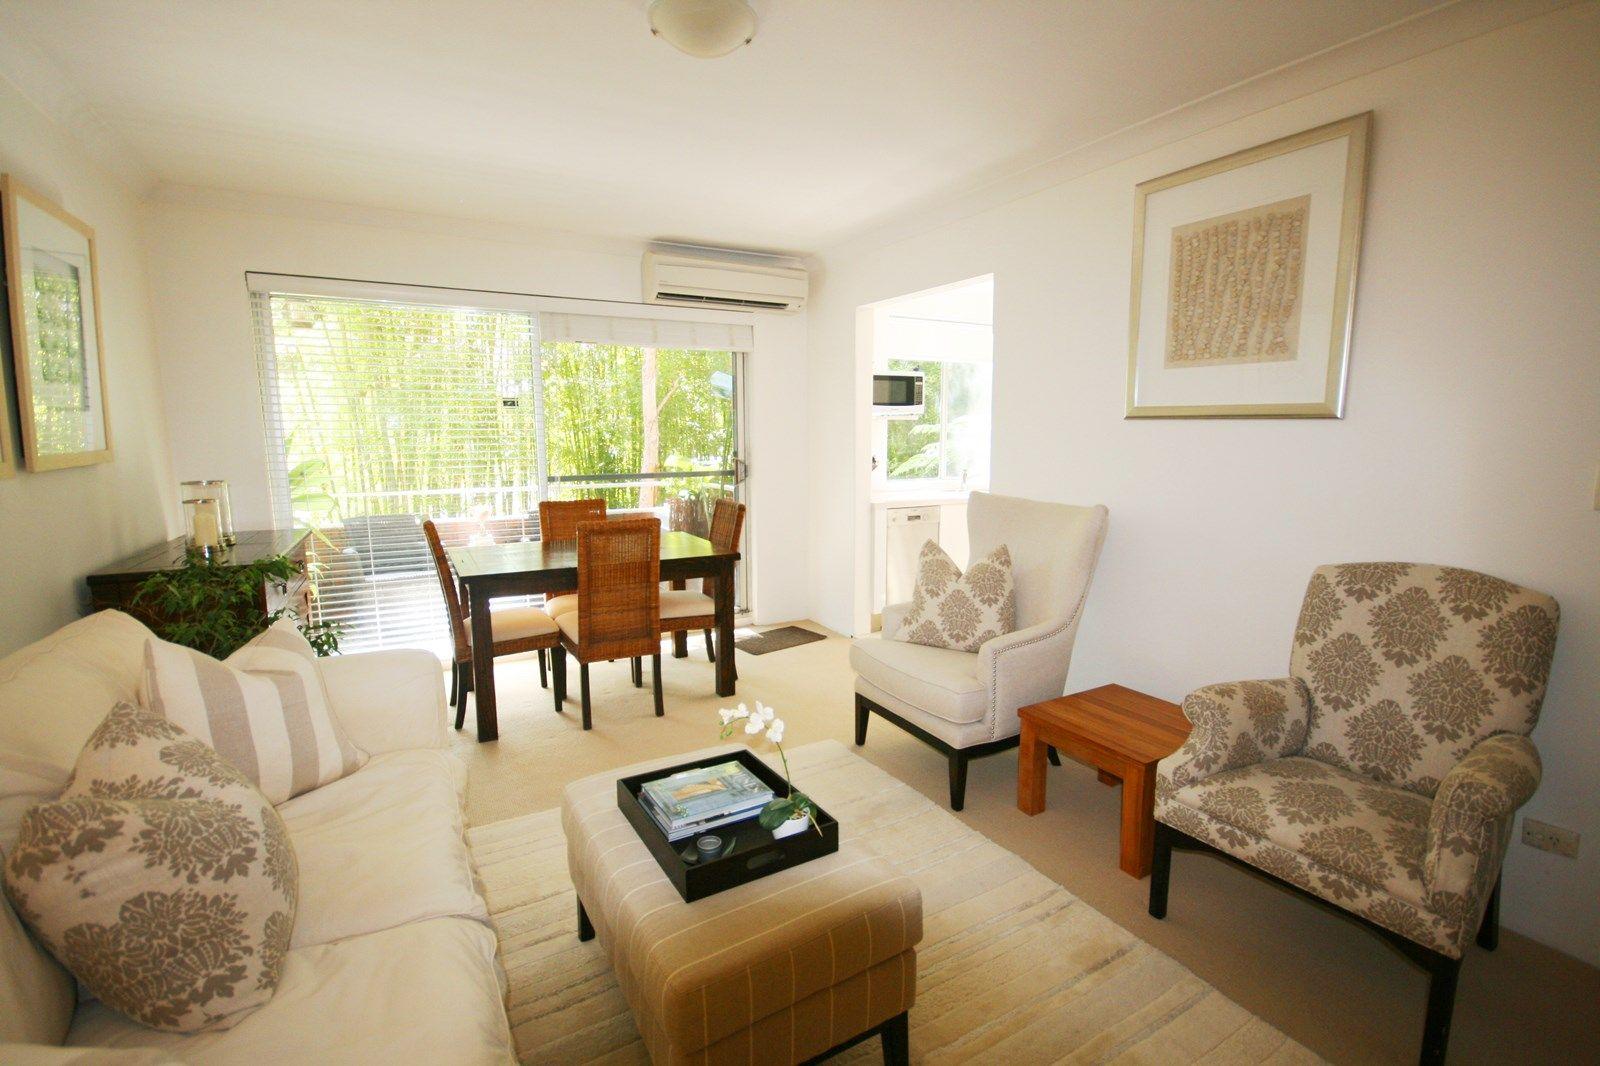 6/14-16 Hazelbank Road, Wollstonecraft NSW 2065, Image 1